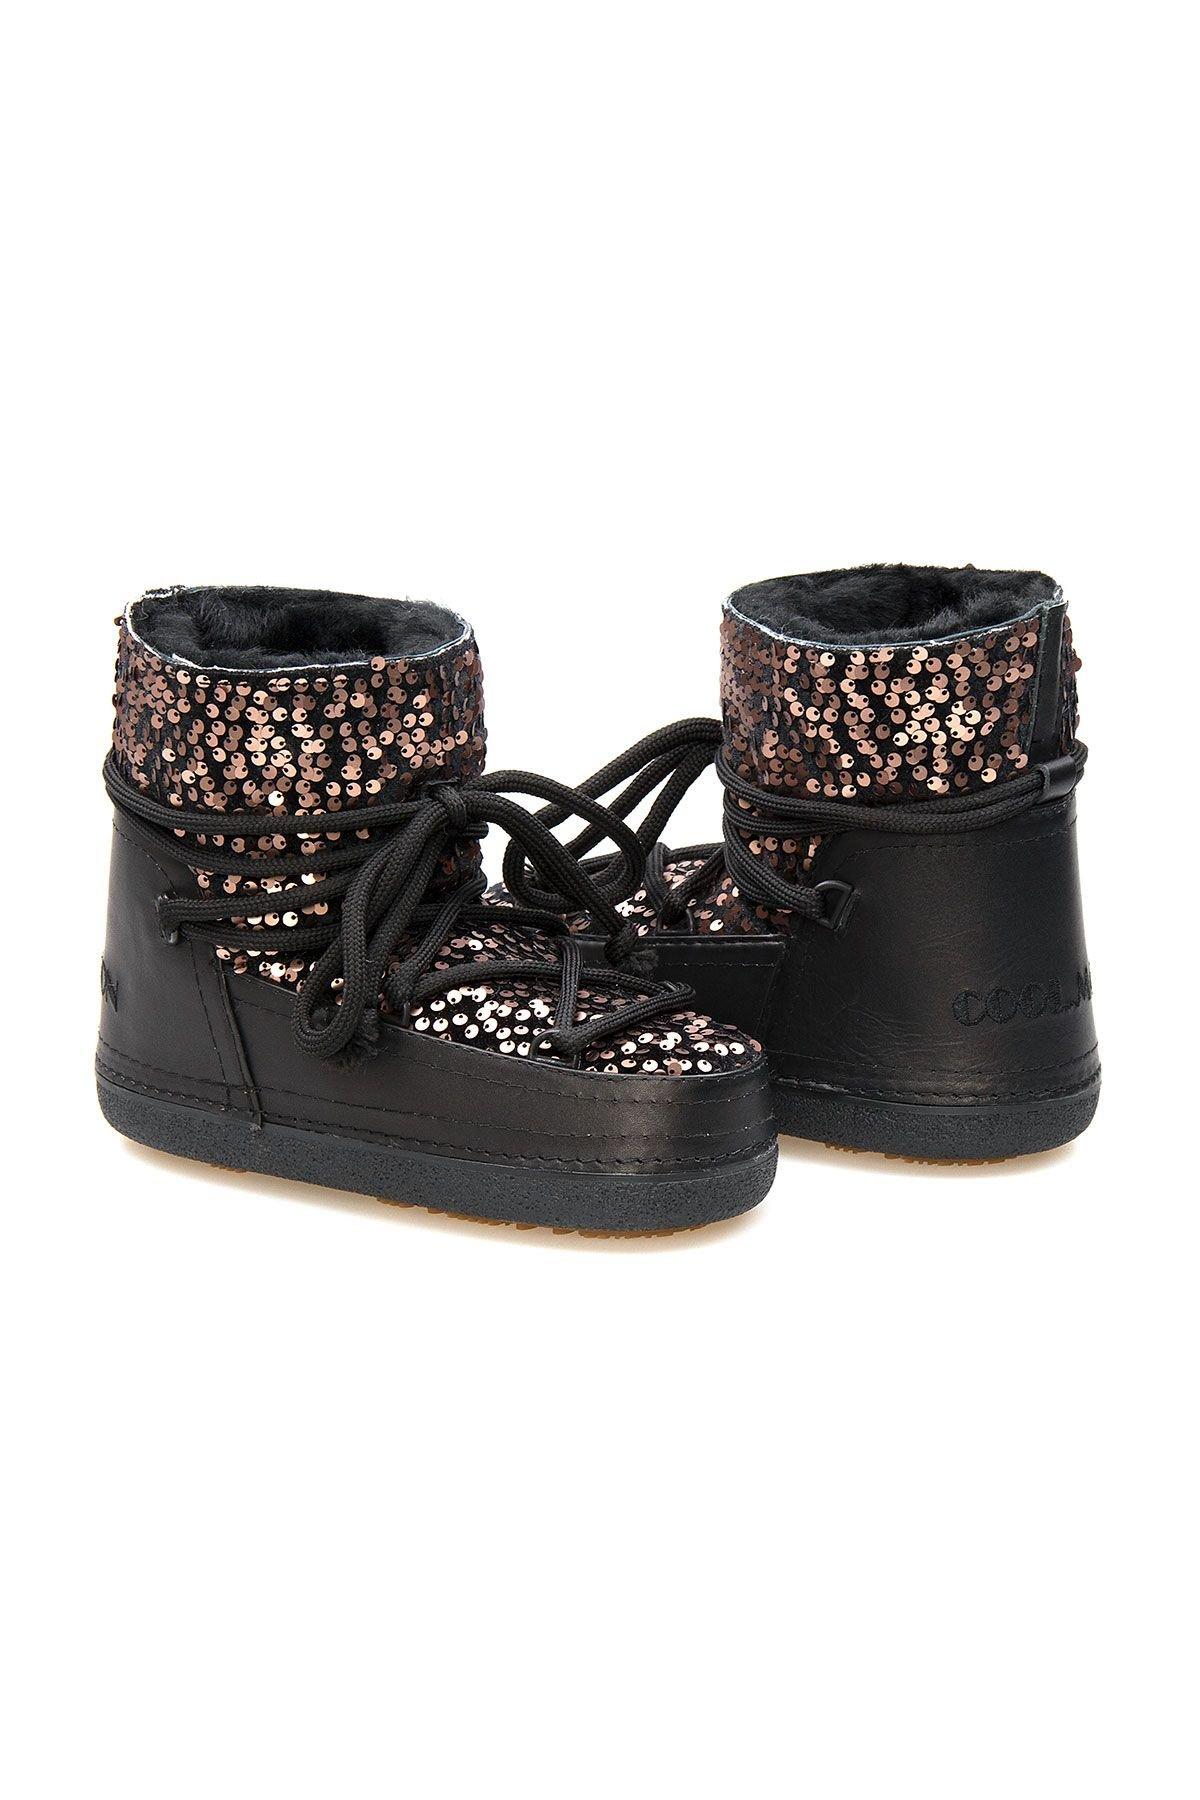 Cool Moon Sheepskin Women's Snow Boots With Sequin 251322 Bronze